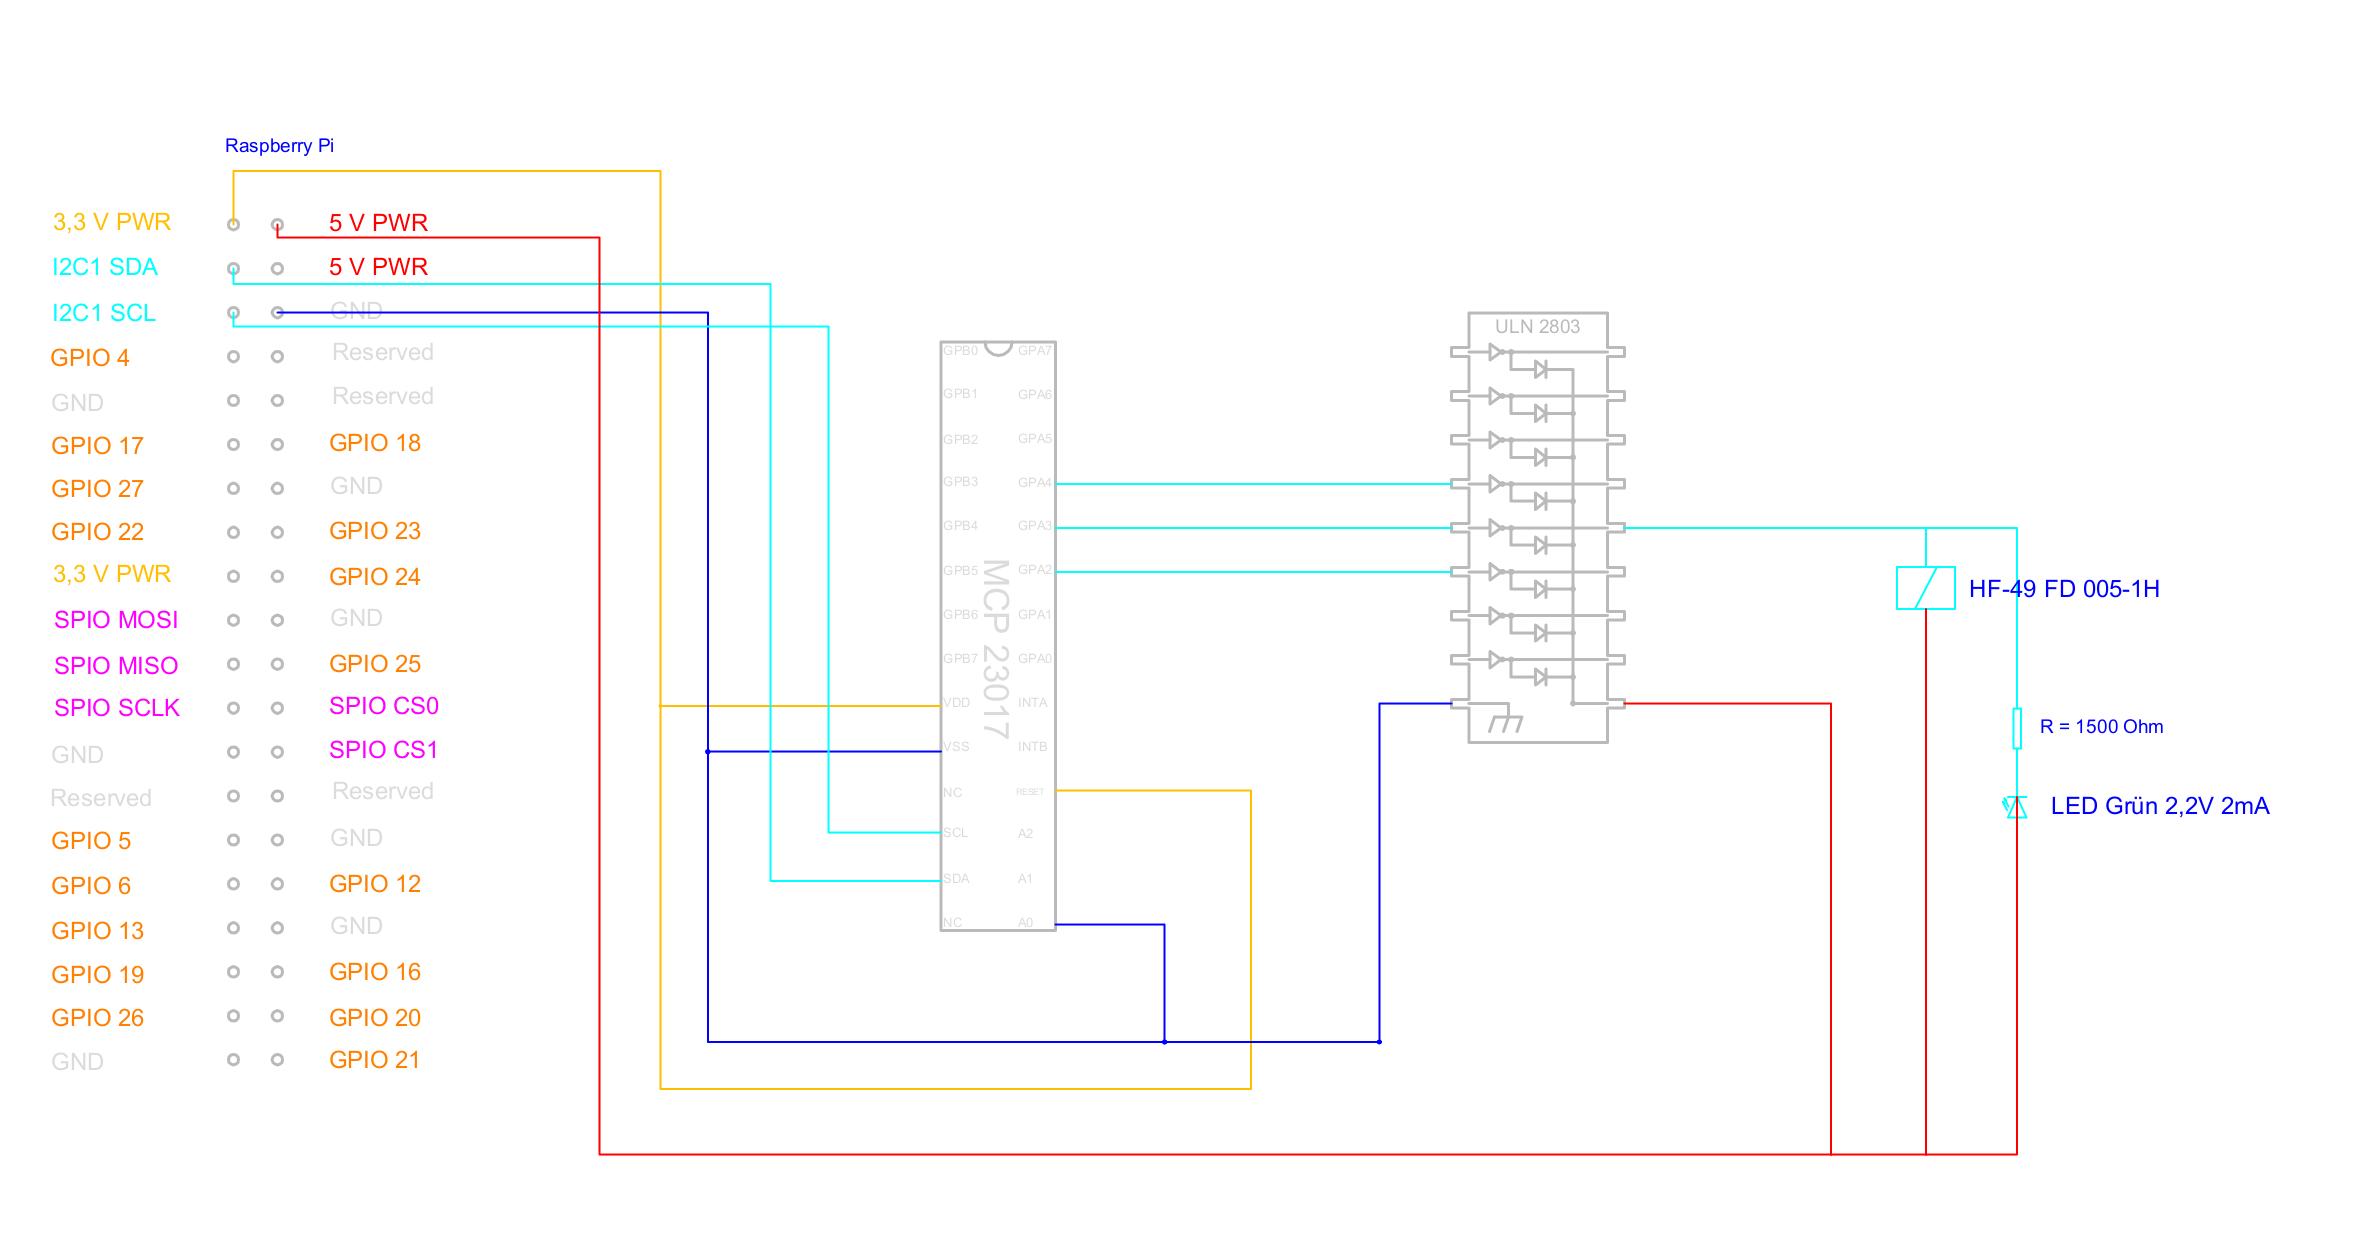 Raspi und Relais schaltung - Mikrocontroller.net